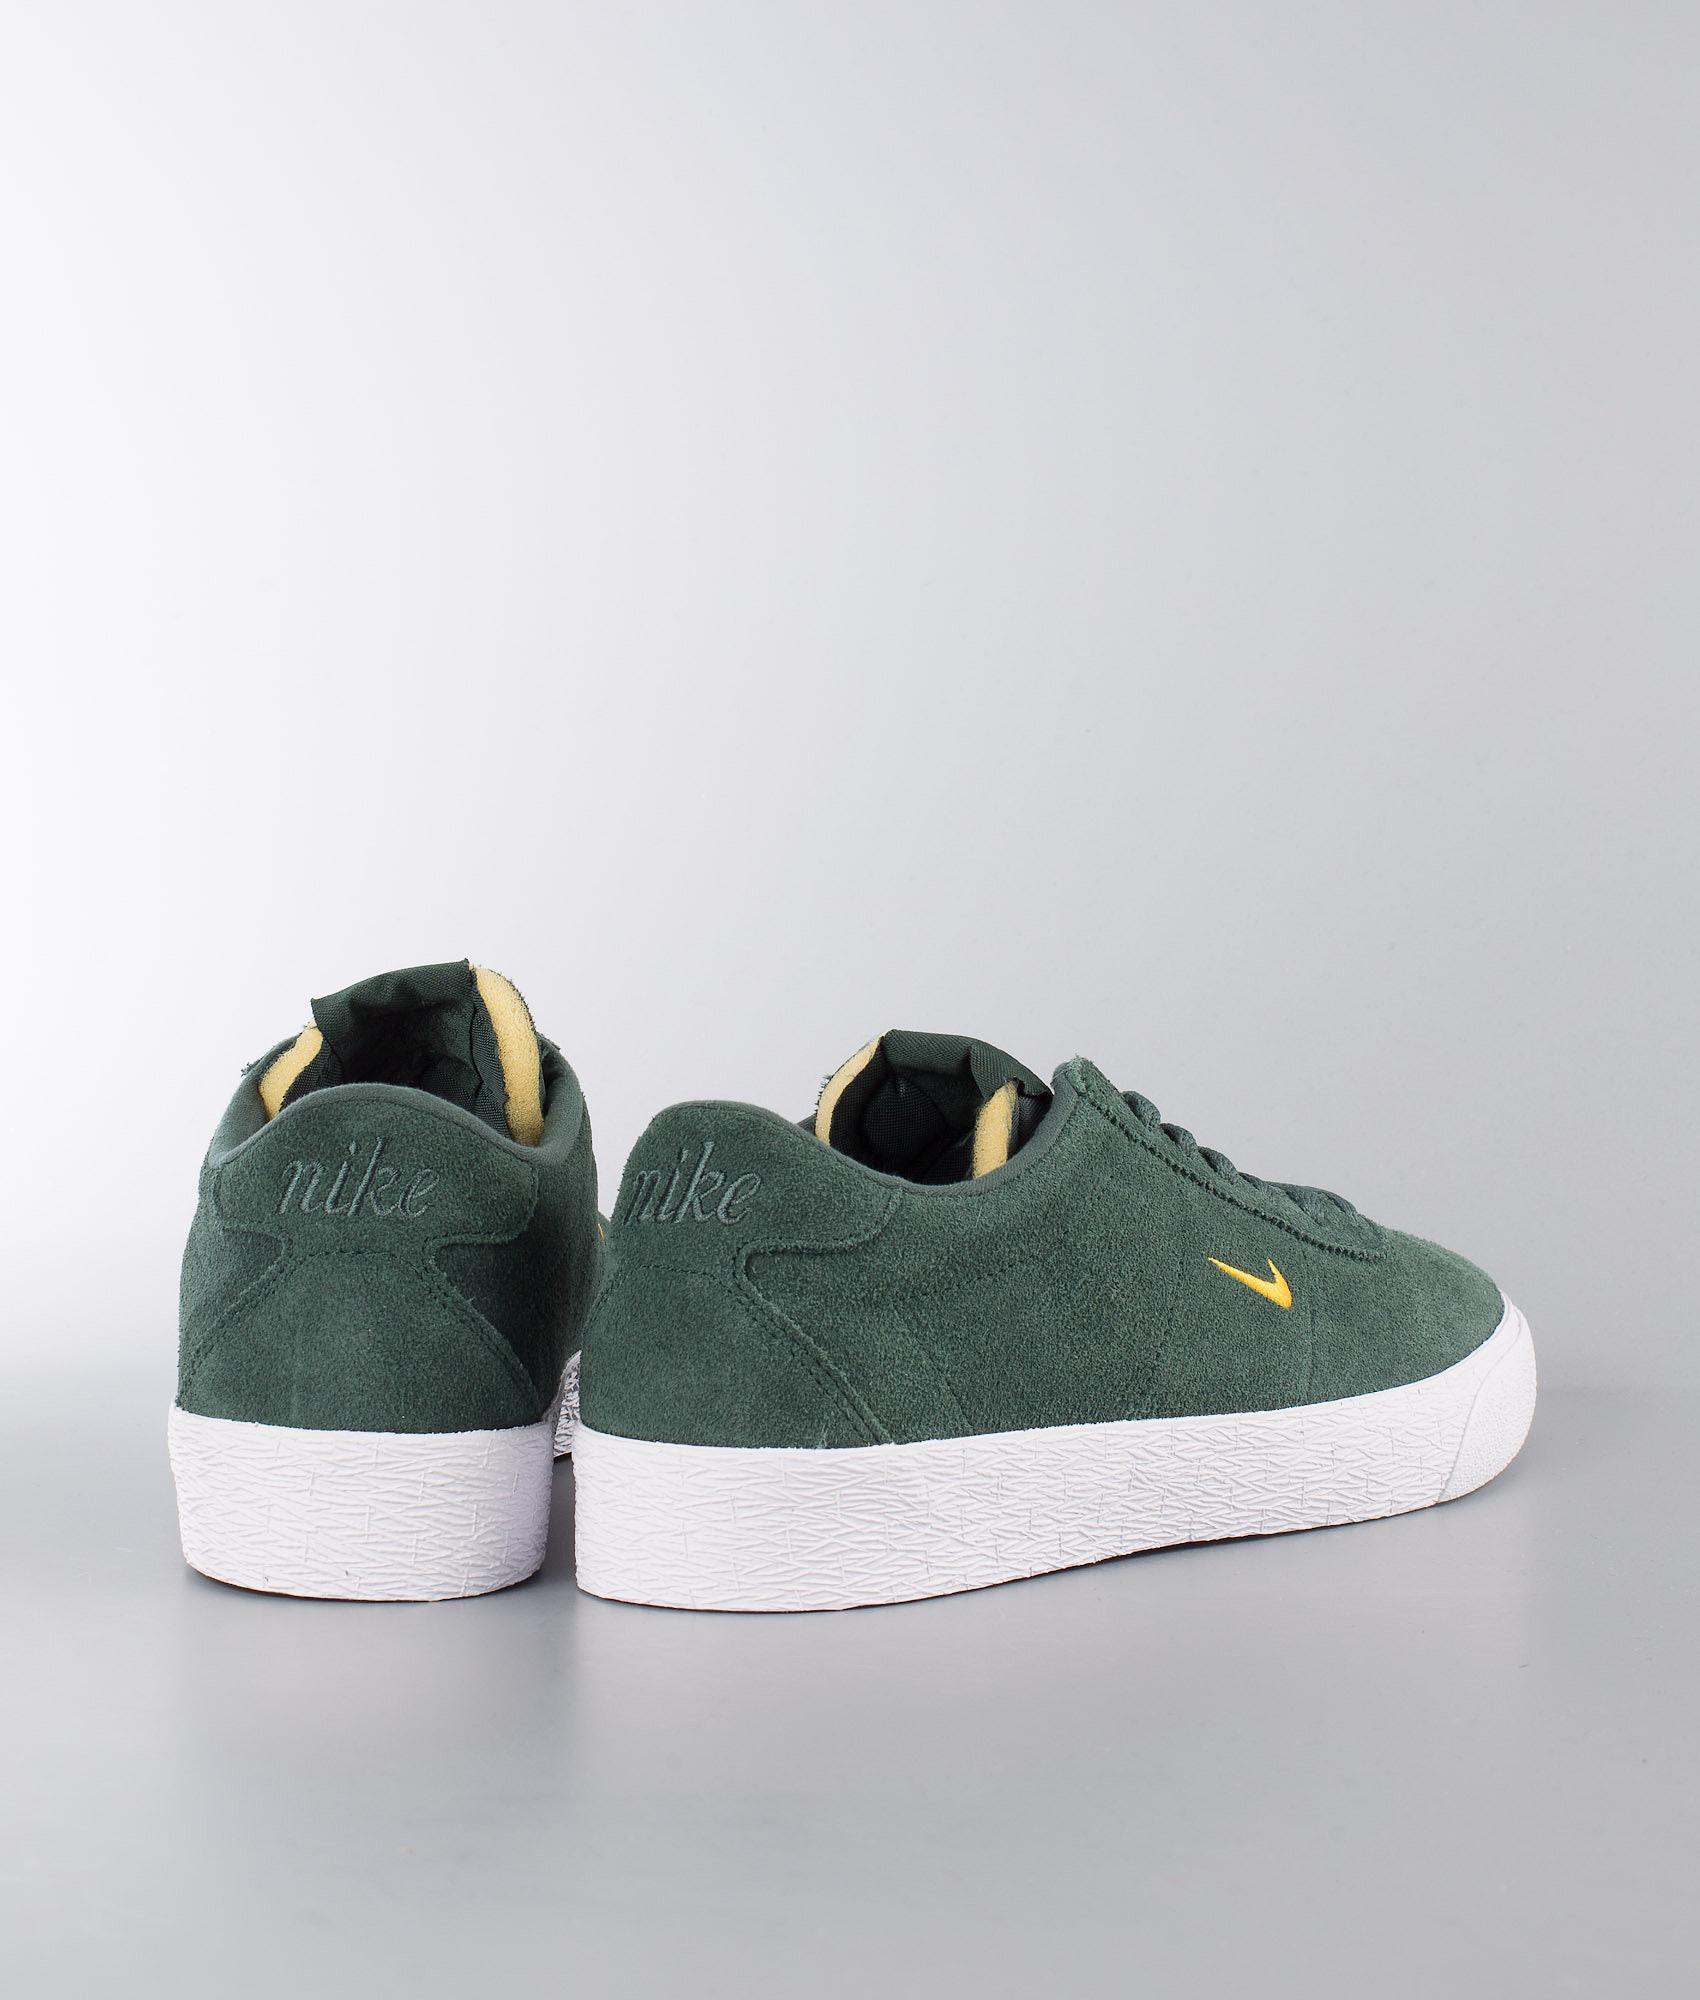 80ad96935681 Nike Zoom Bruin Shoes Midnight Green Yellow Ochre-White - Ridestore.com